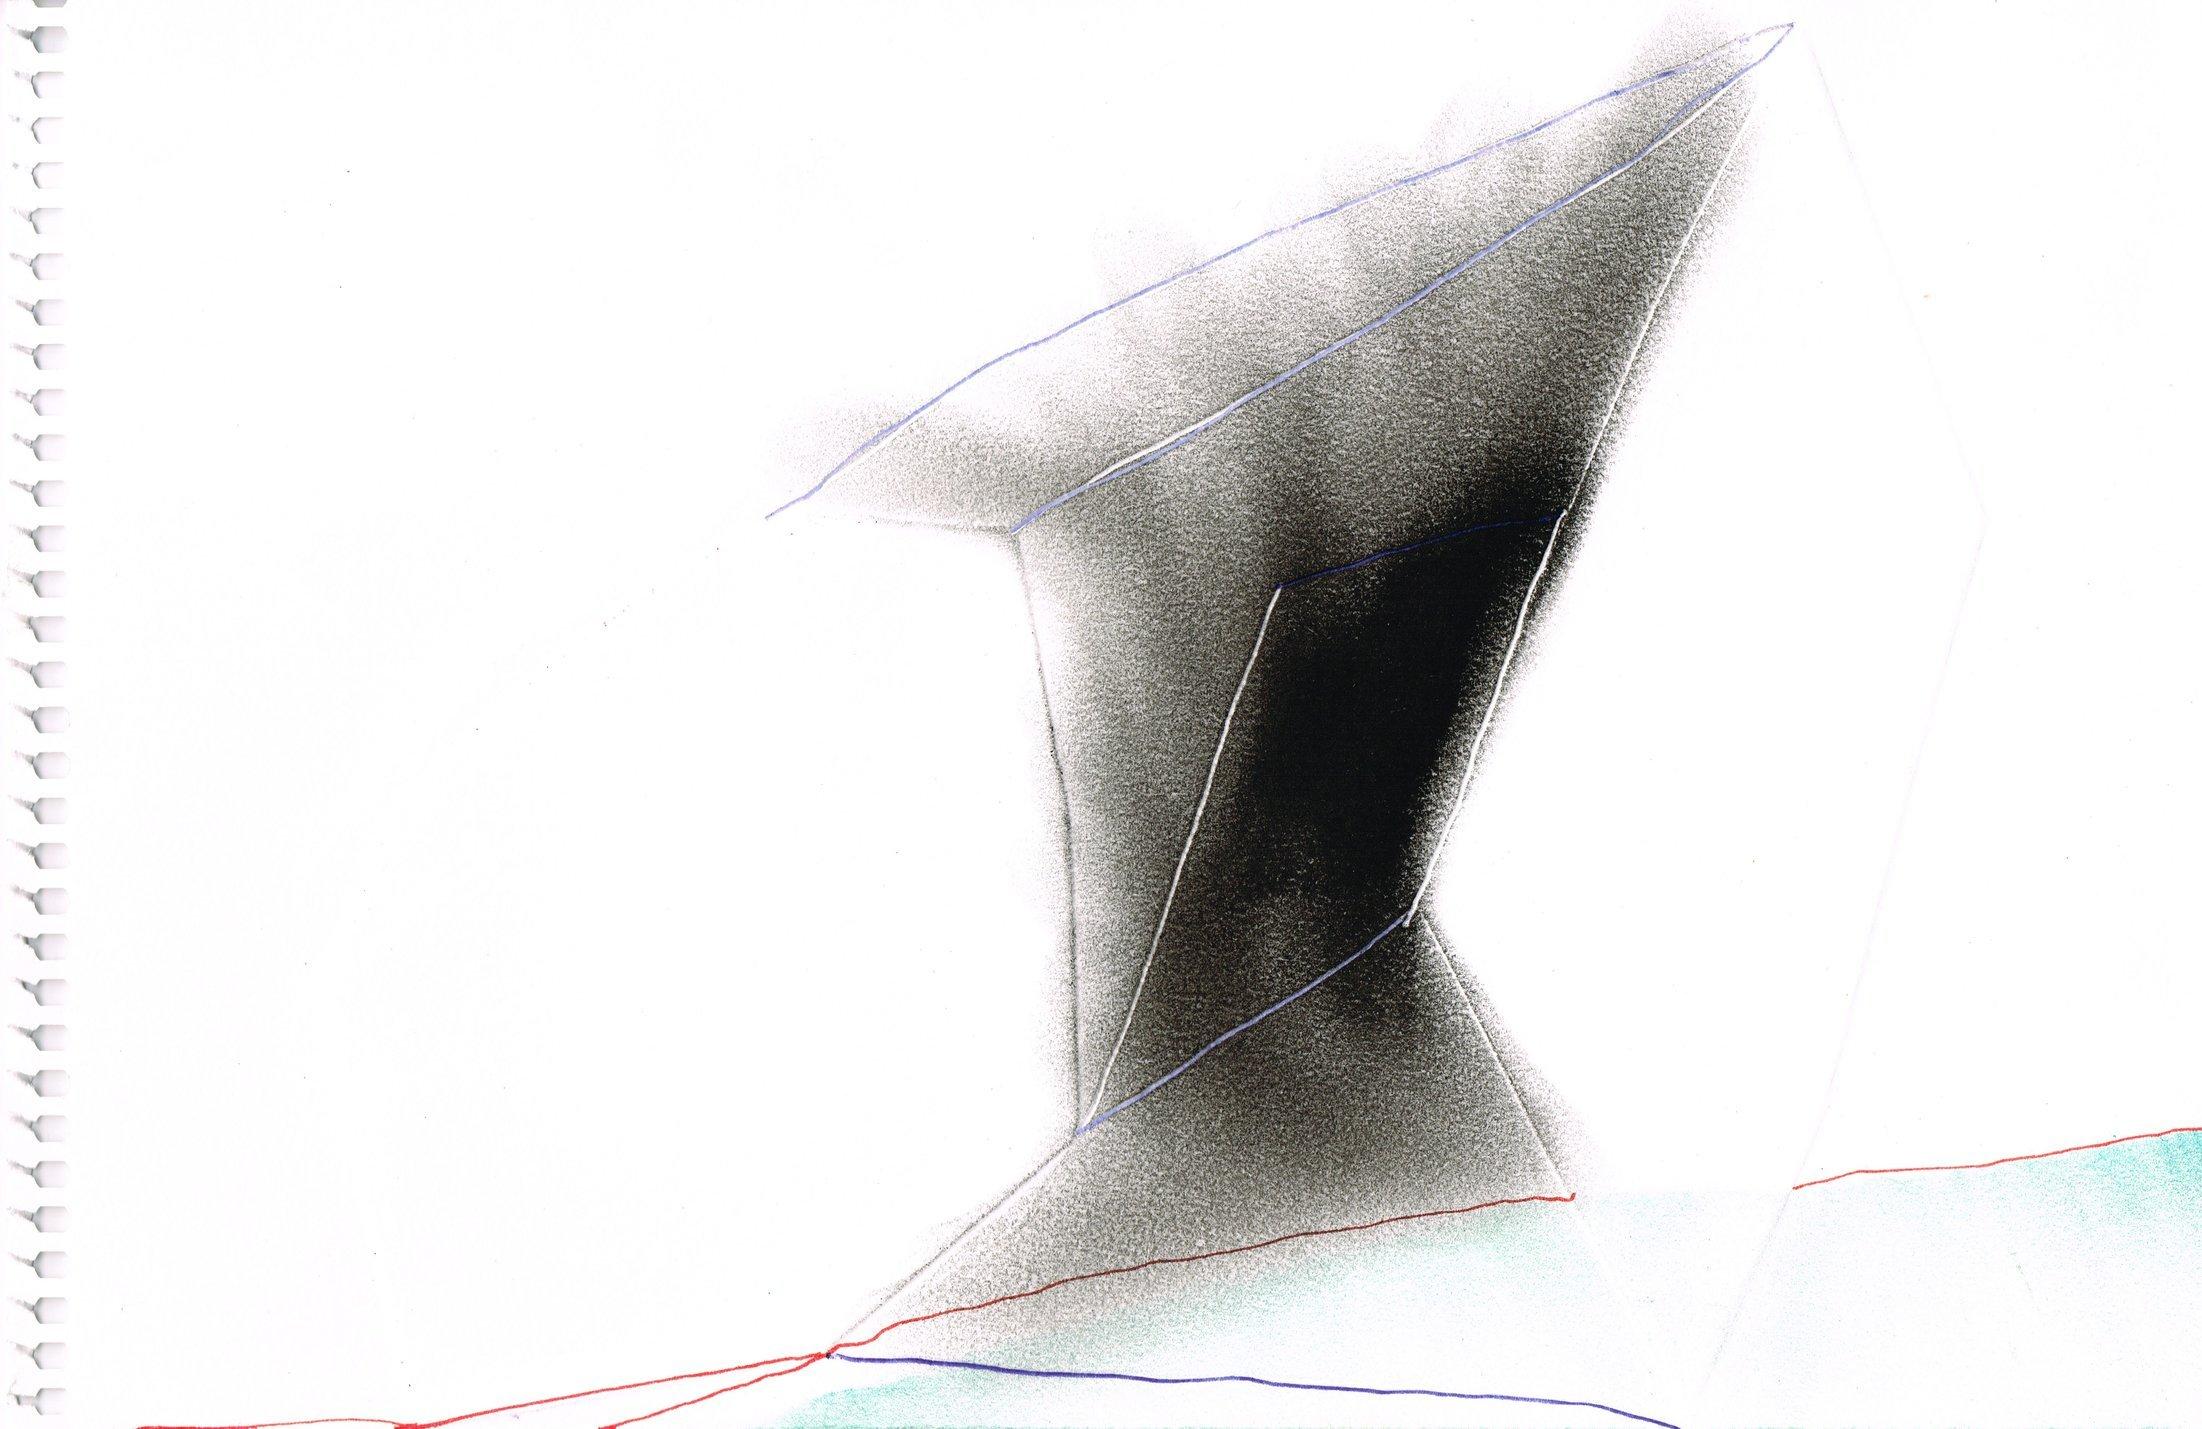 Zonder Titel, 2016, 23,8 x 16,1 cm